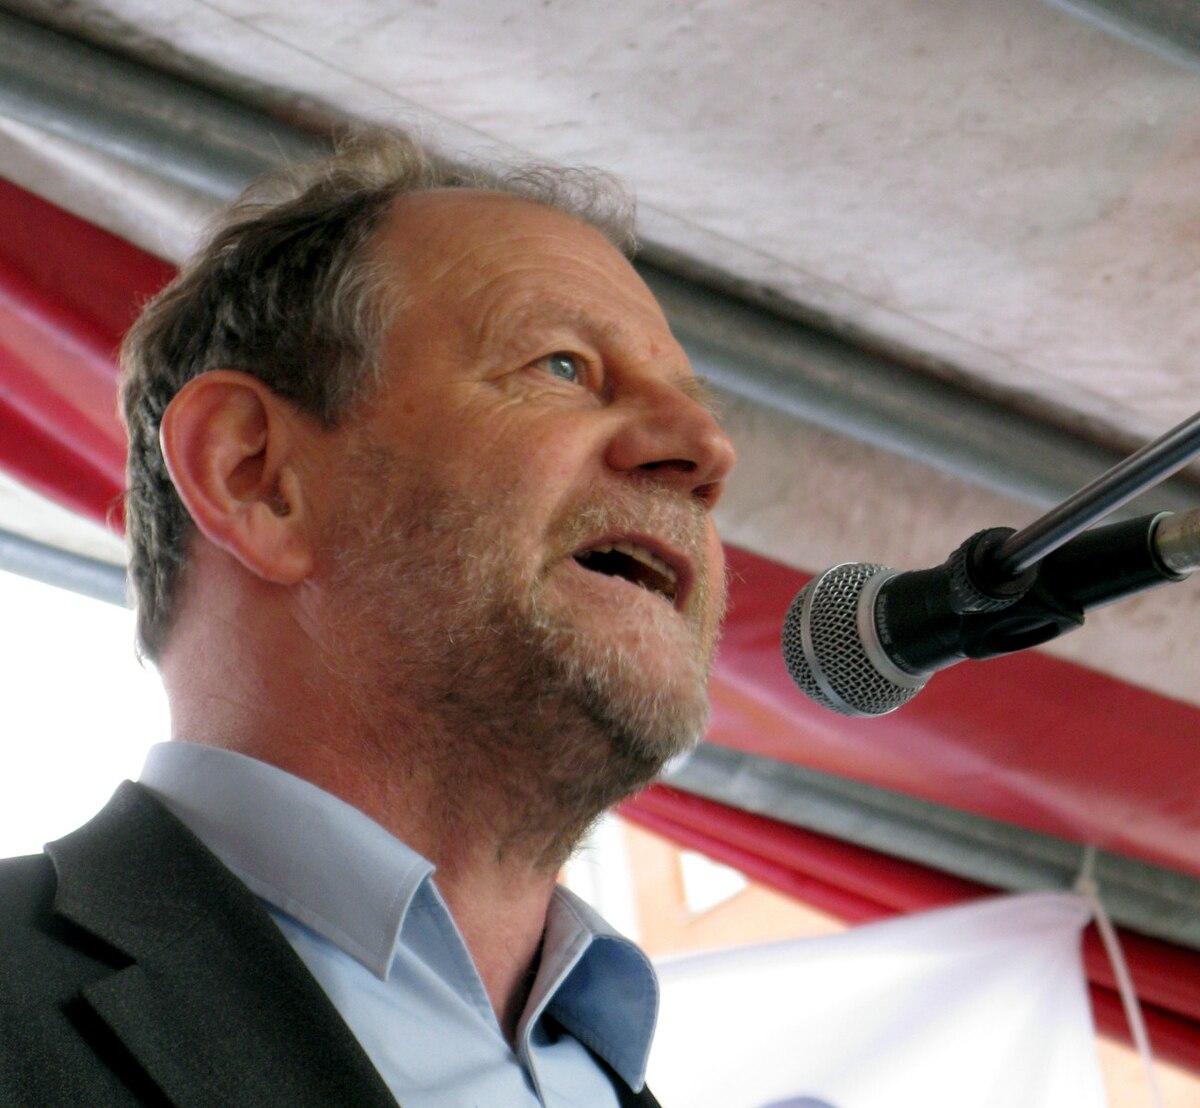 Michael cramer politiker wikipedia for Cramer berlin